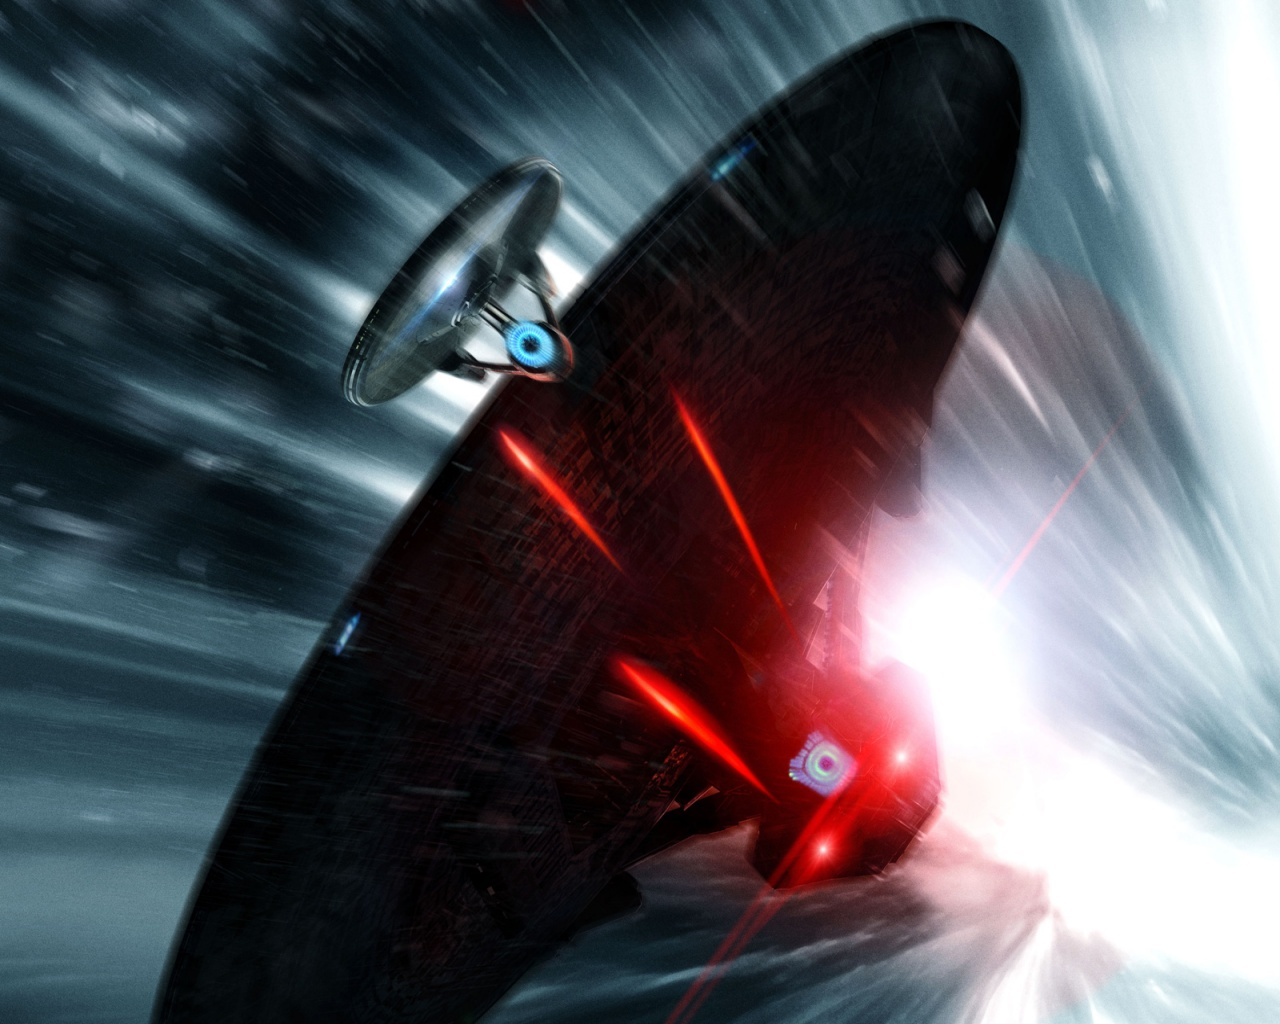 star trek into darkness movie 1280x1024 Screensaver wallpaper 1280x1024